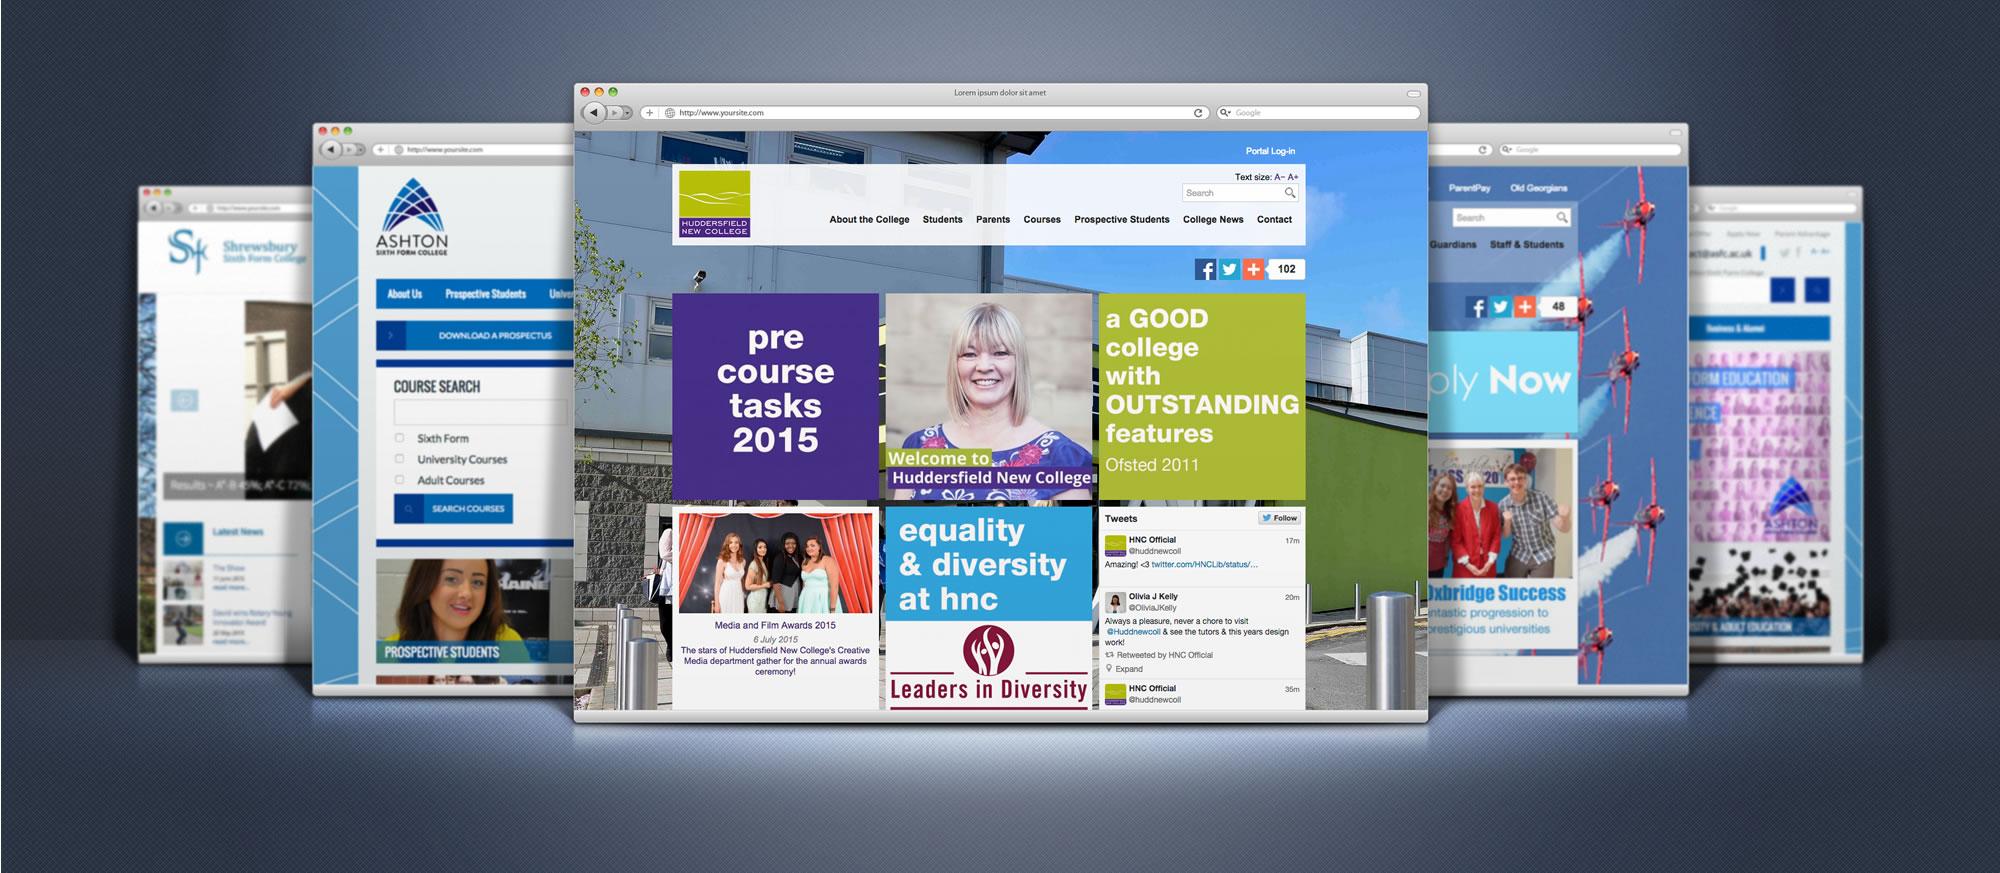 sixth-form-website-design-banner